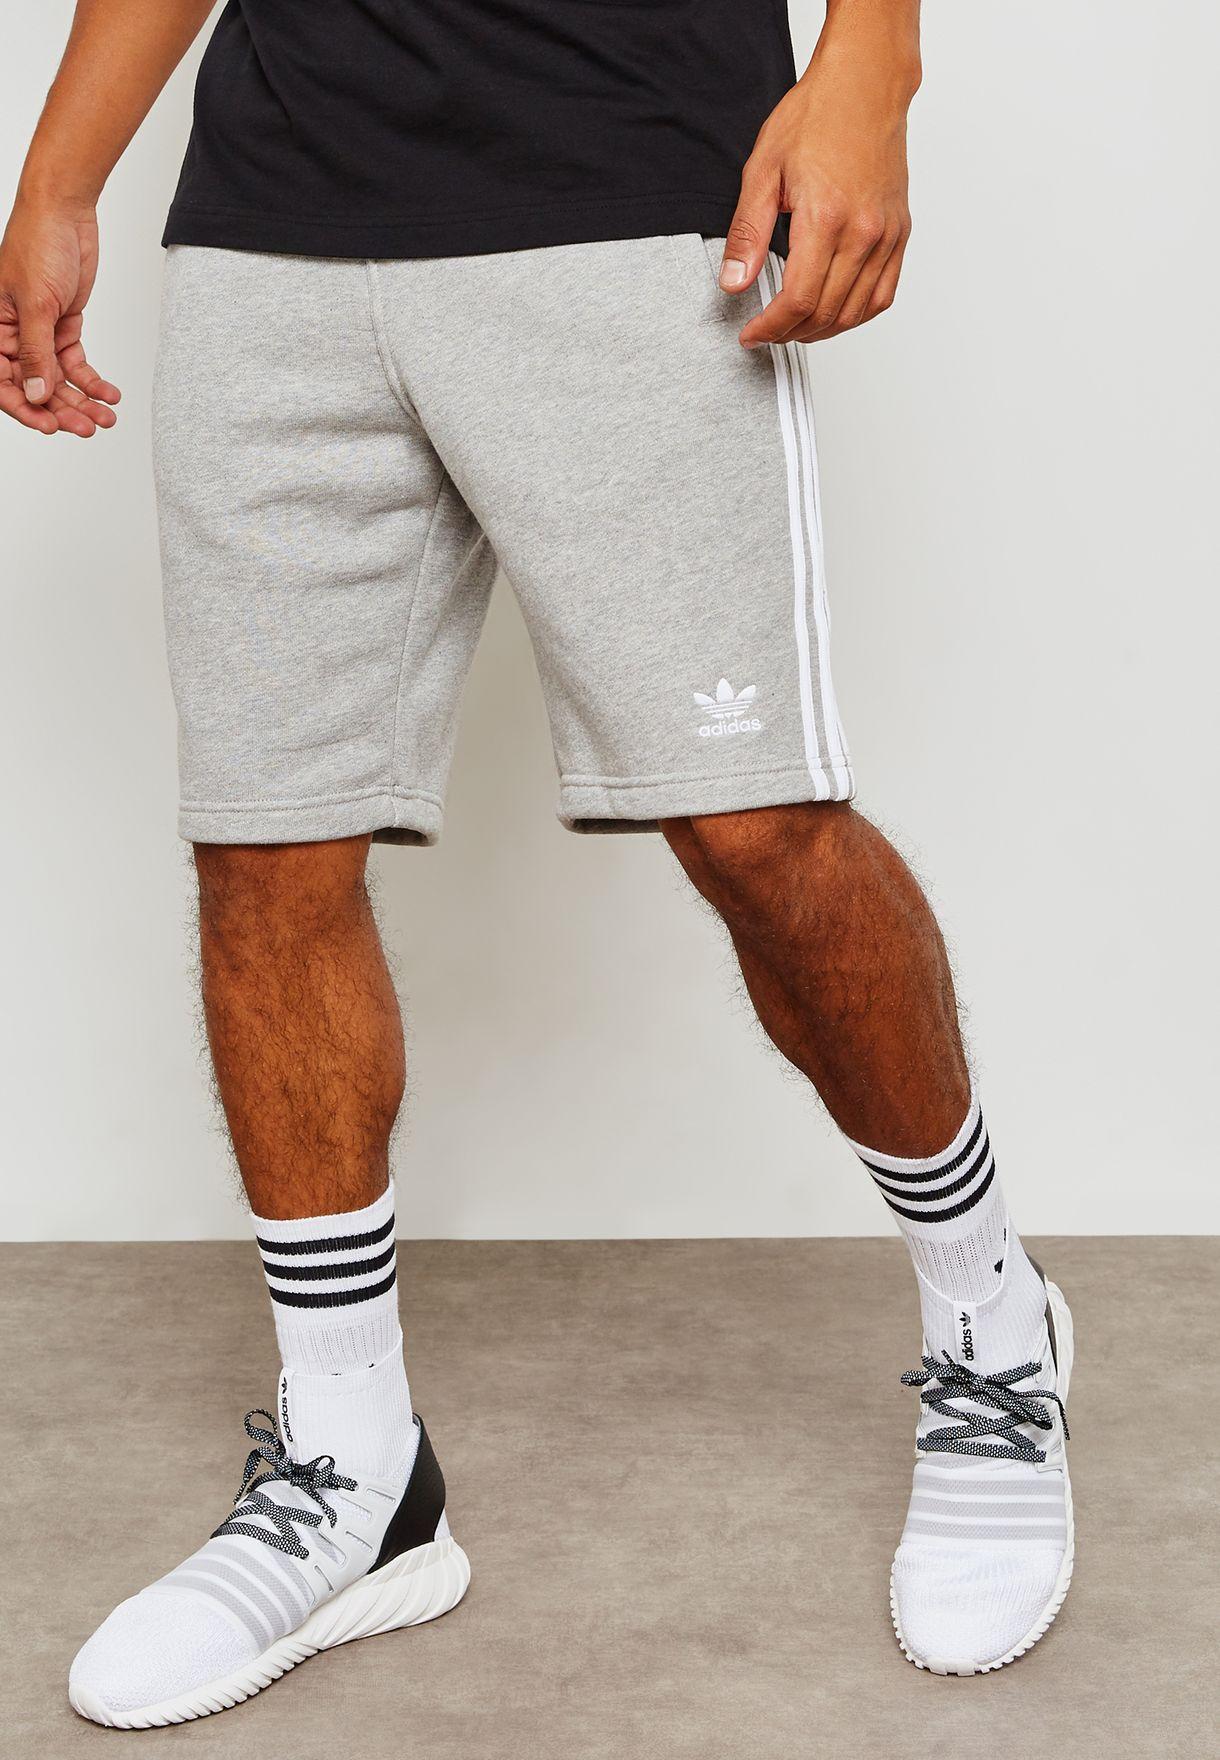 3 Stripes Adicolor Casual Men's 1/2 Shorts